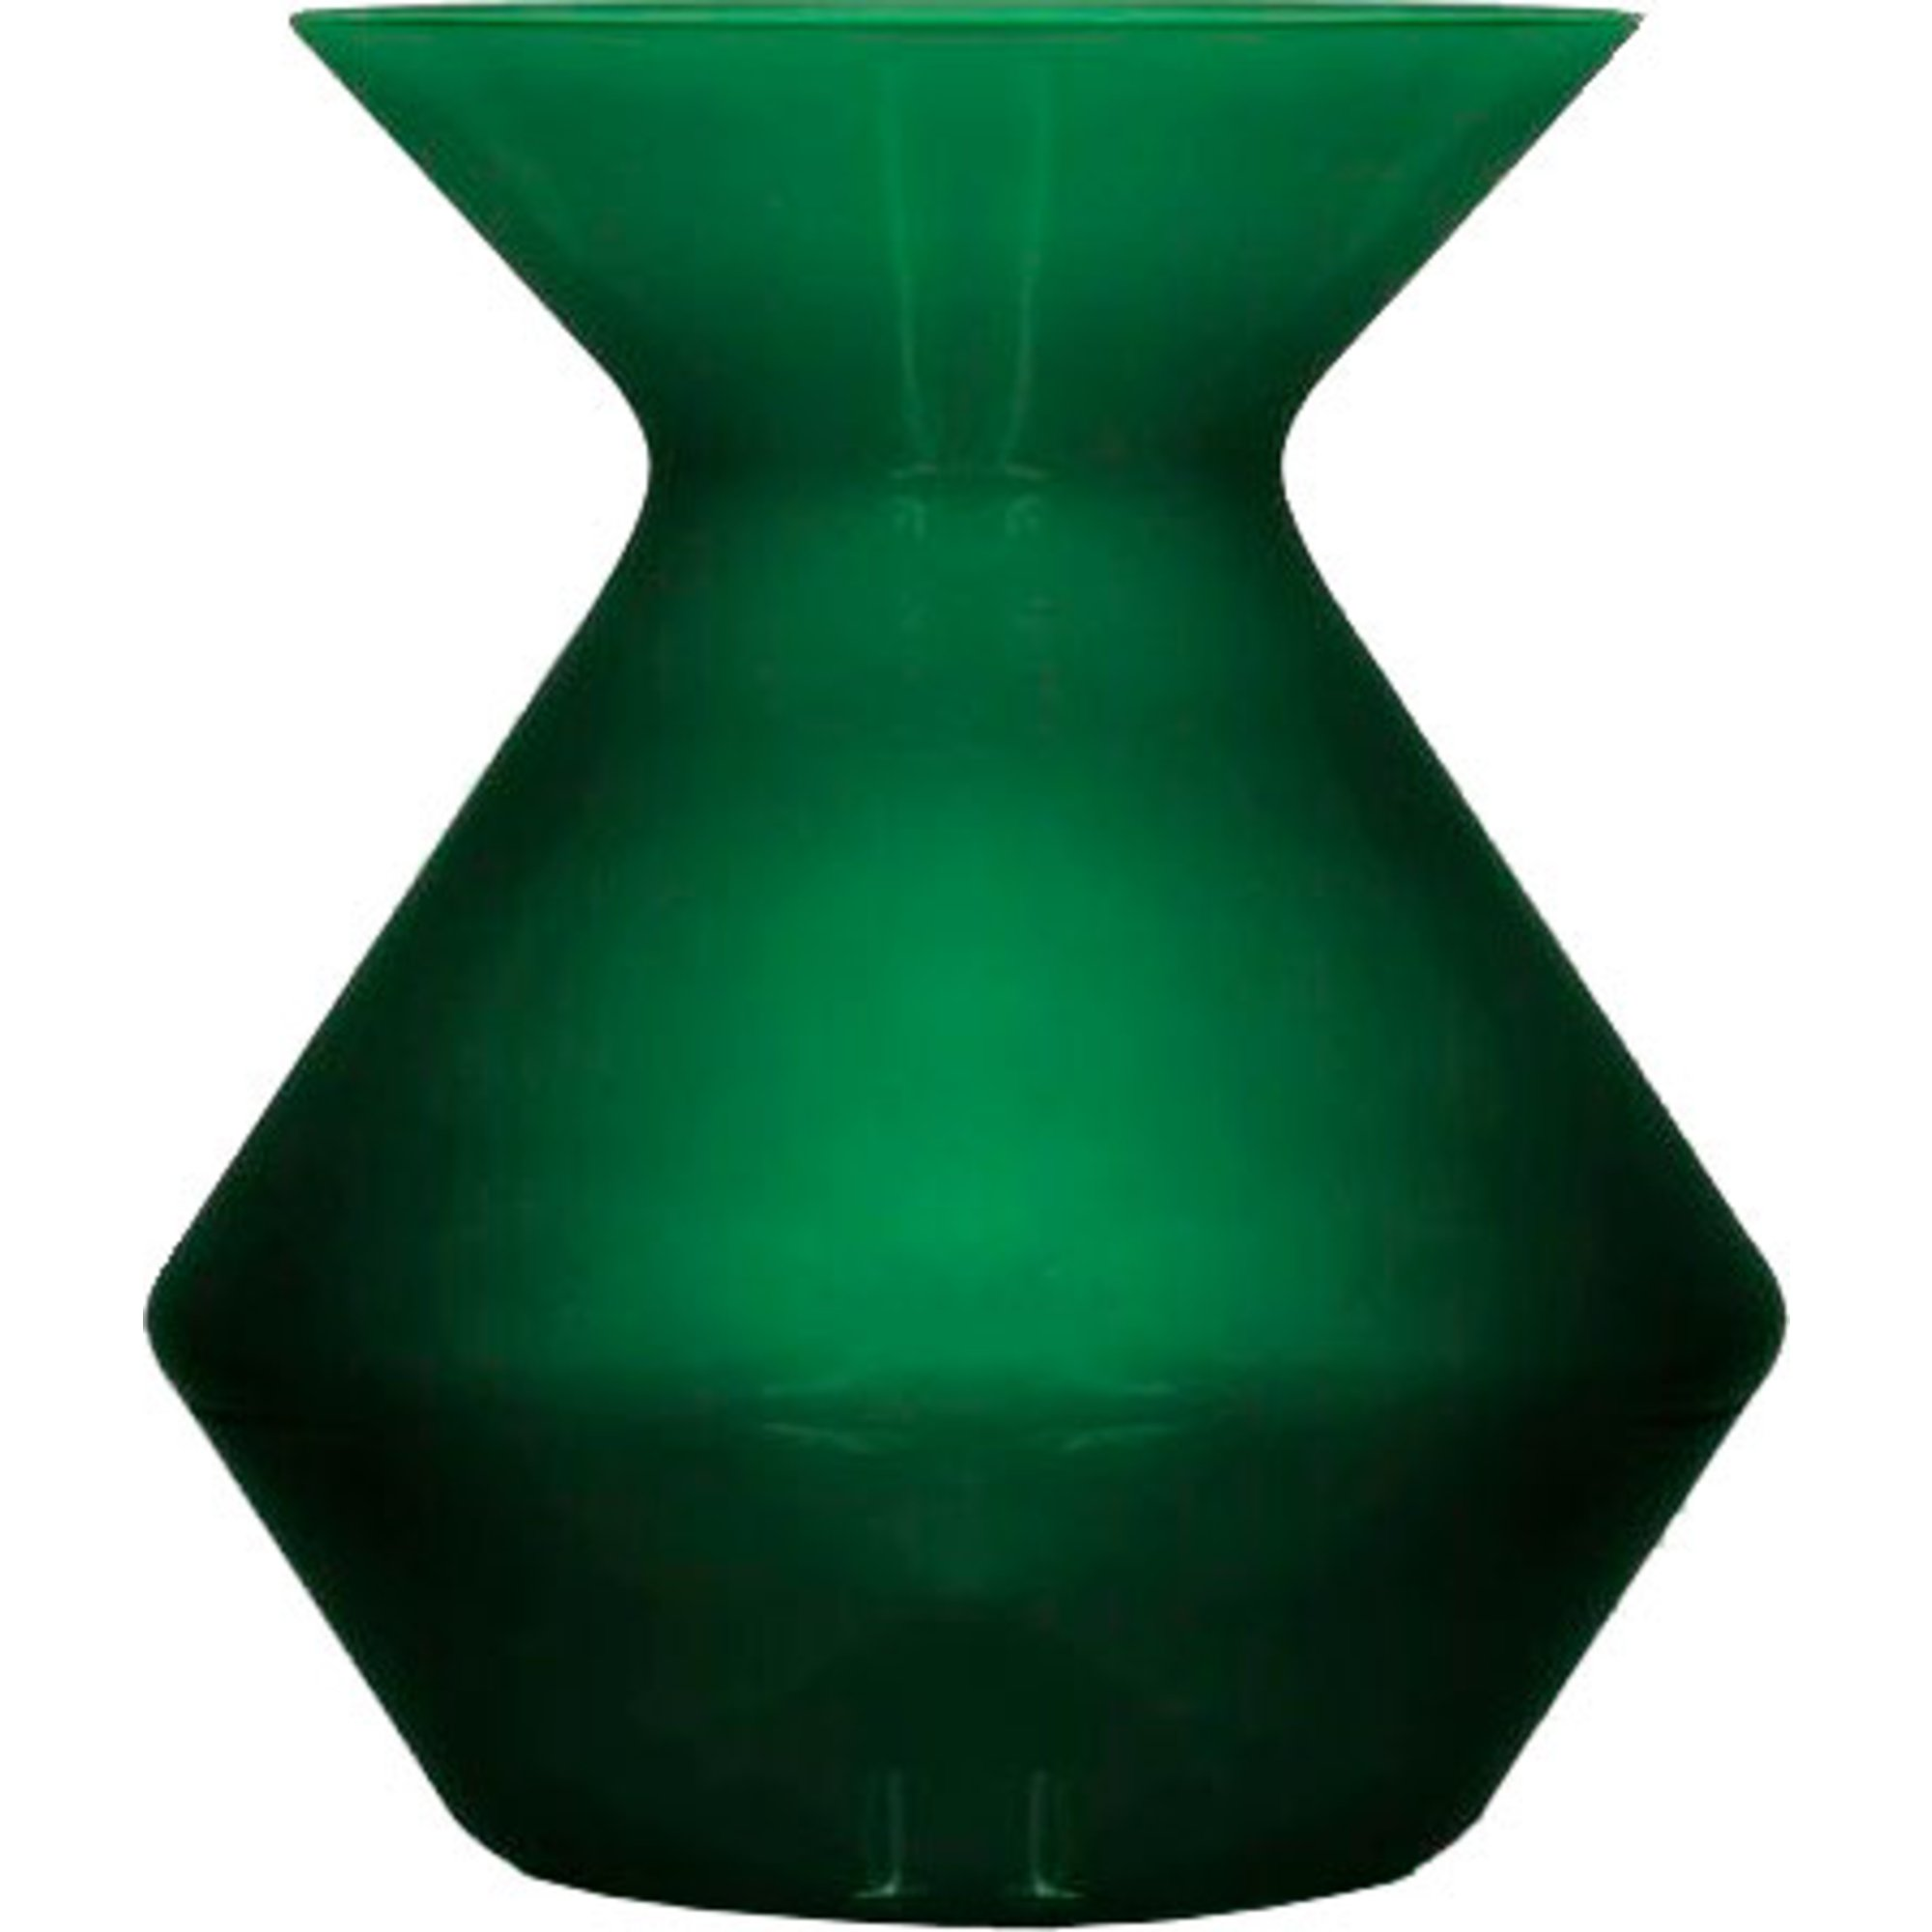 Zalto Spittoon 50 spottkopp 610 ml., grön